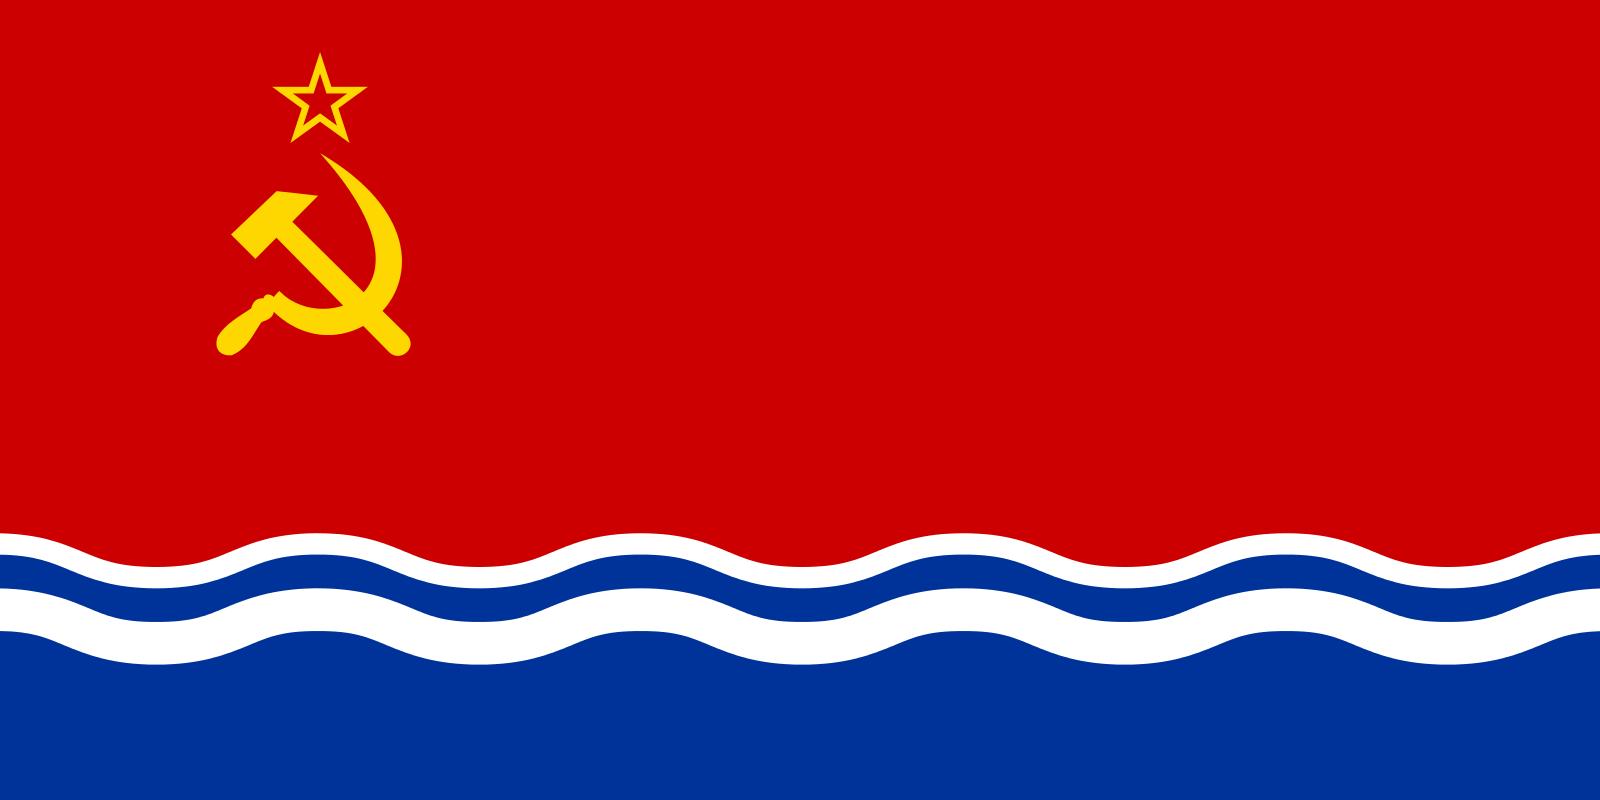 File Flag Of Latvian Ssr Svg Soviet Socialist Republic Latvia Flag Flags Of The World